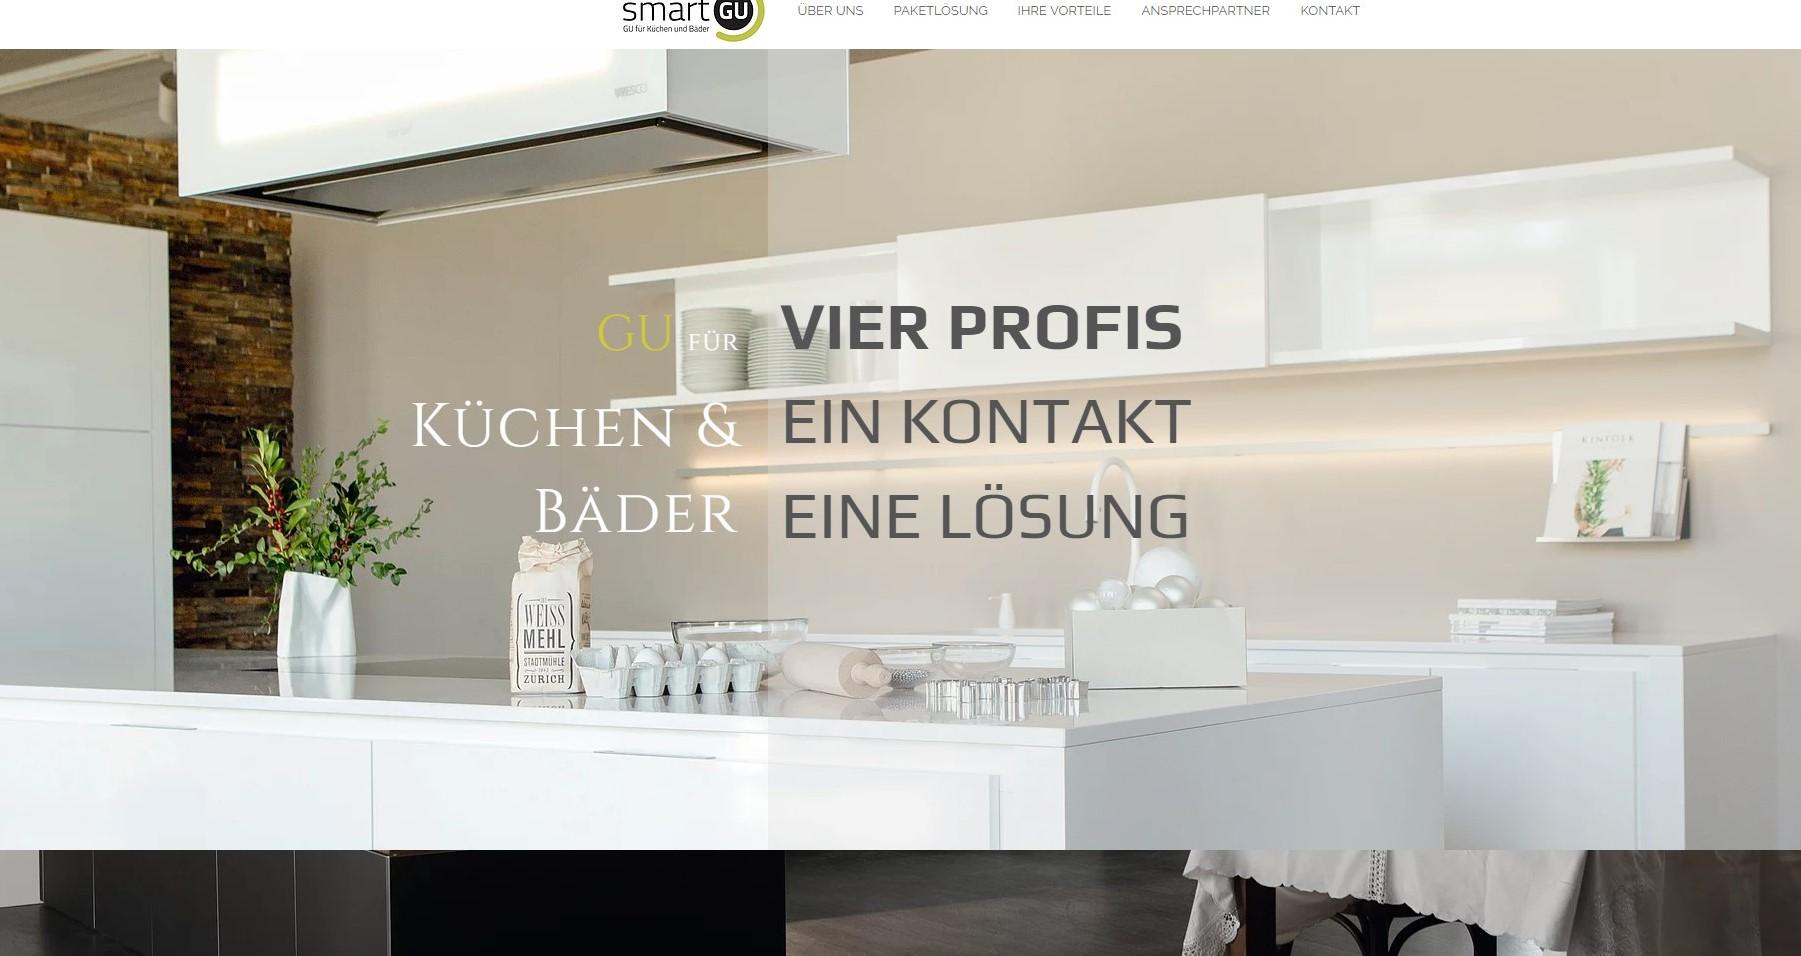 smartgu webseite